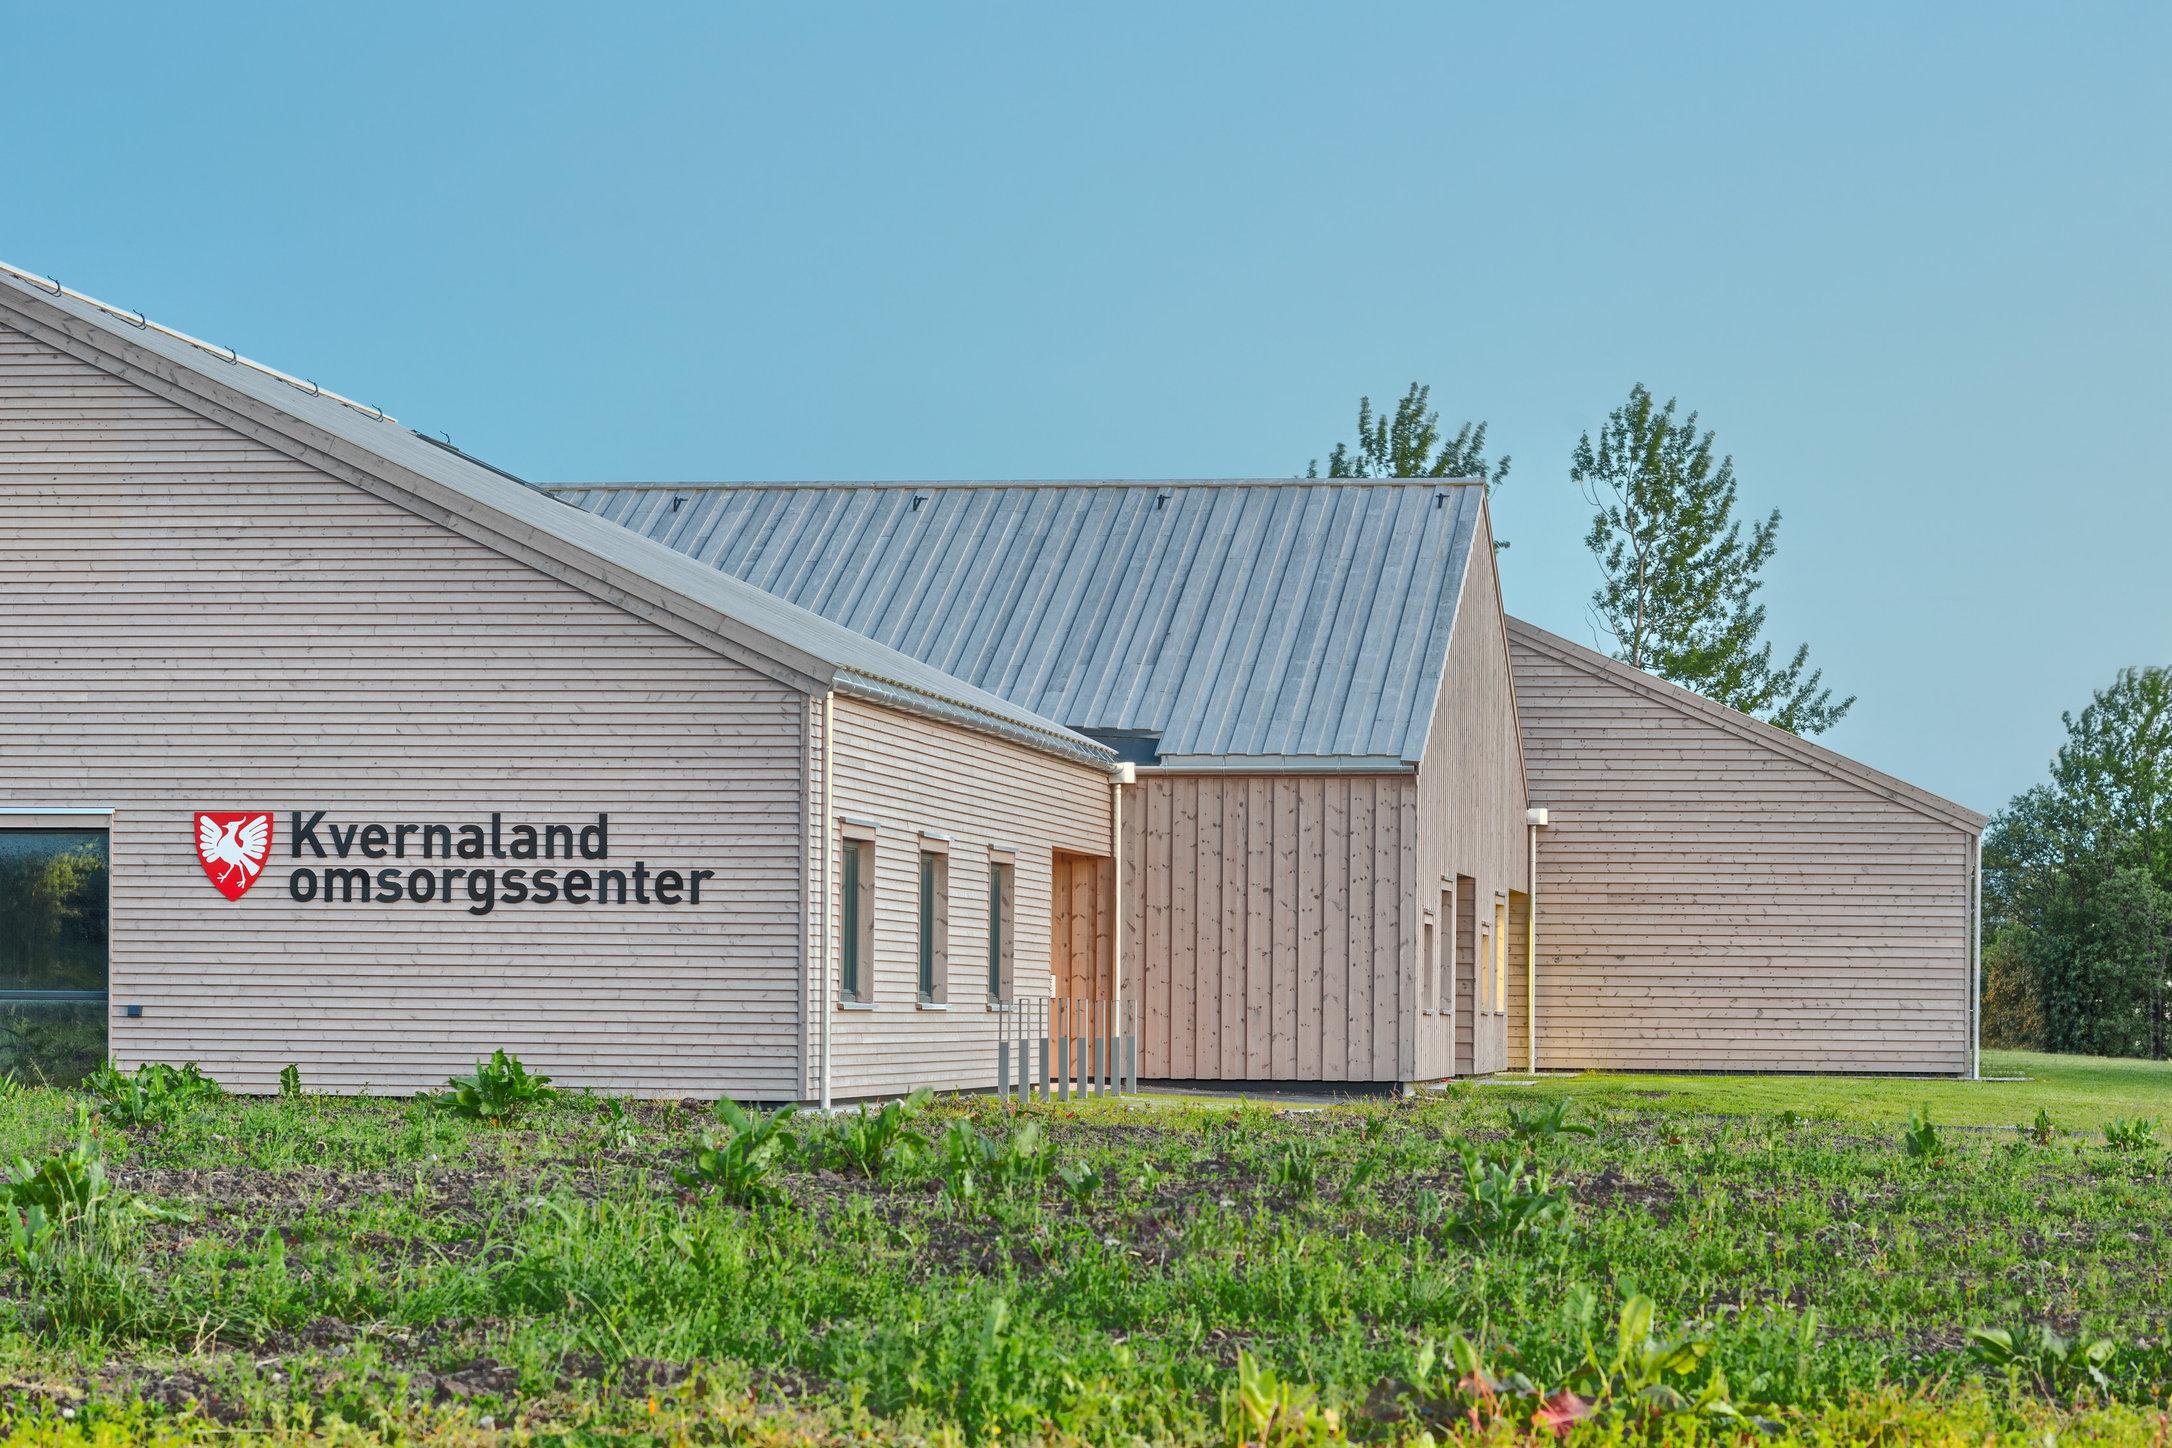 Asplan Viak/JaJa Architects